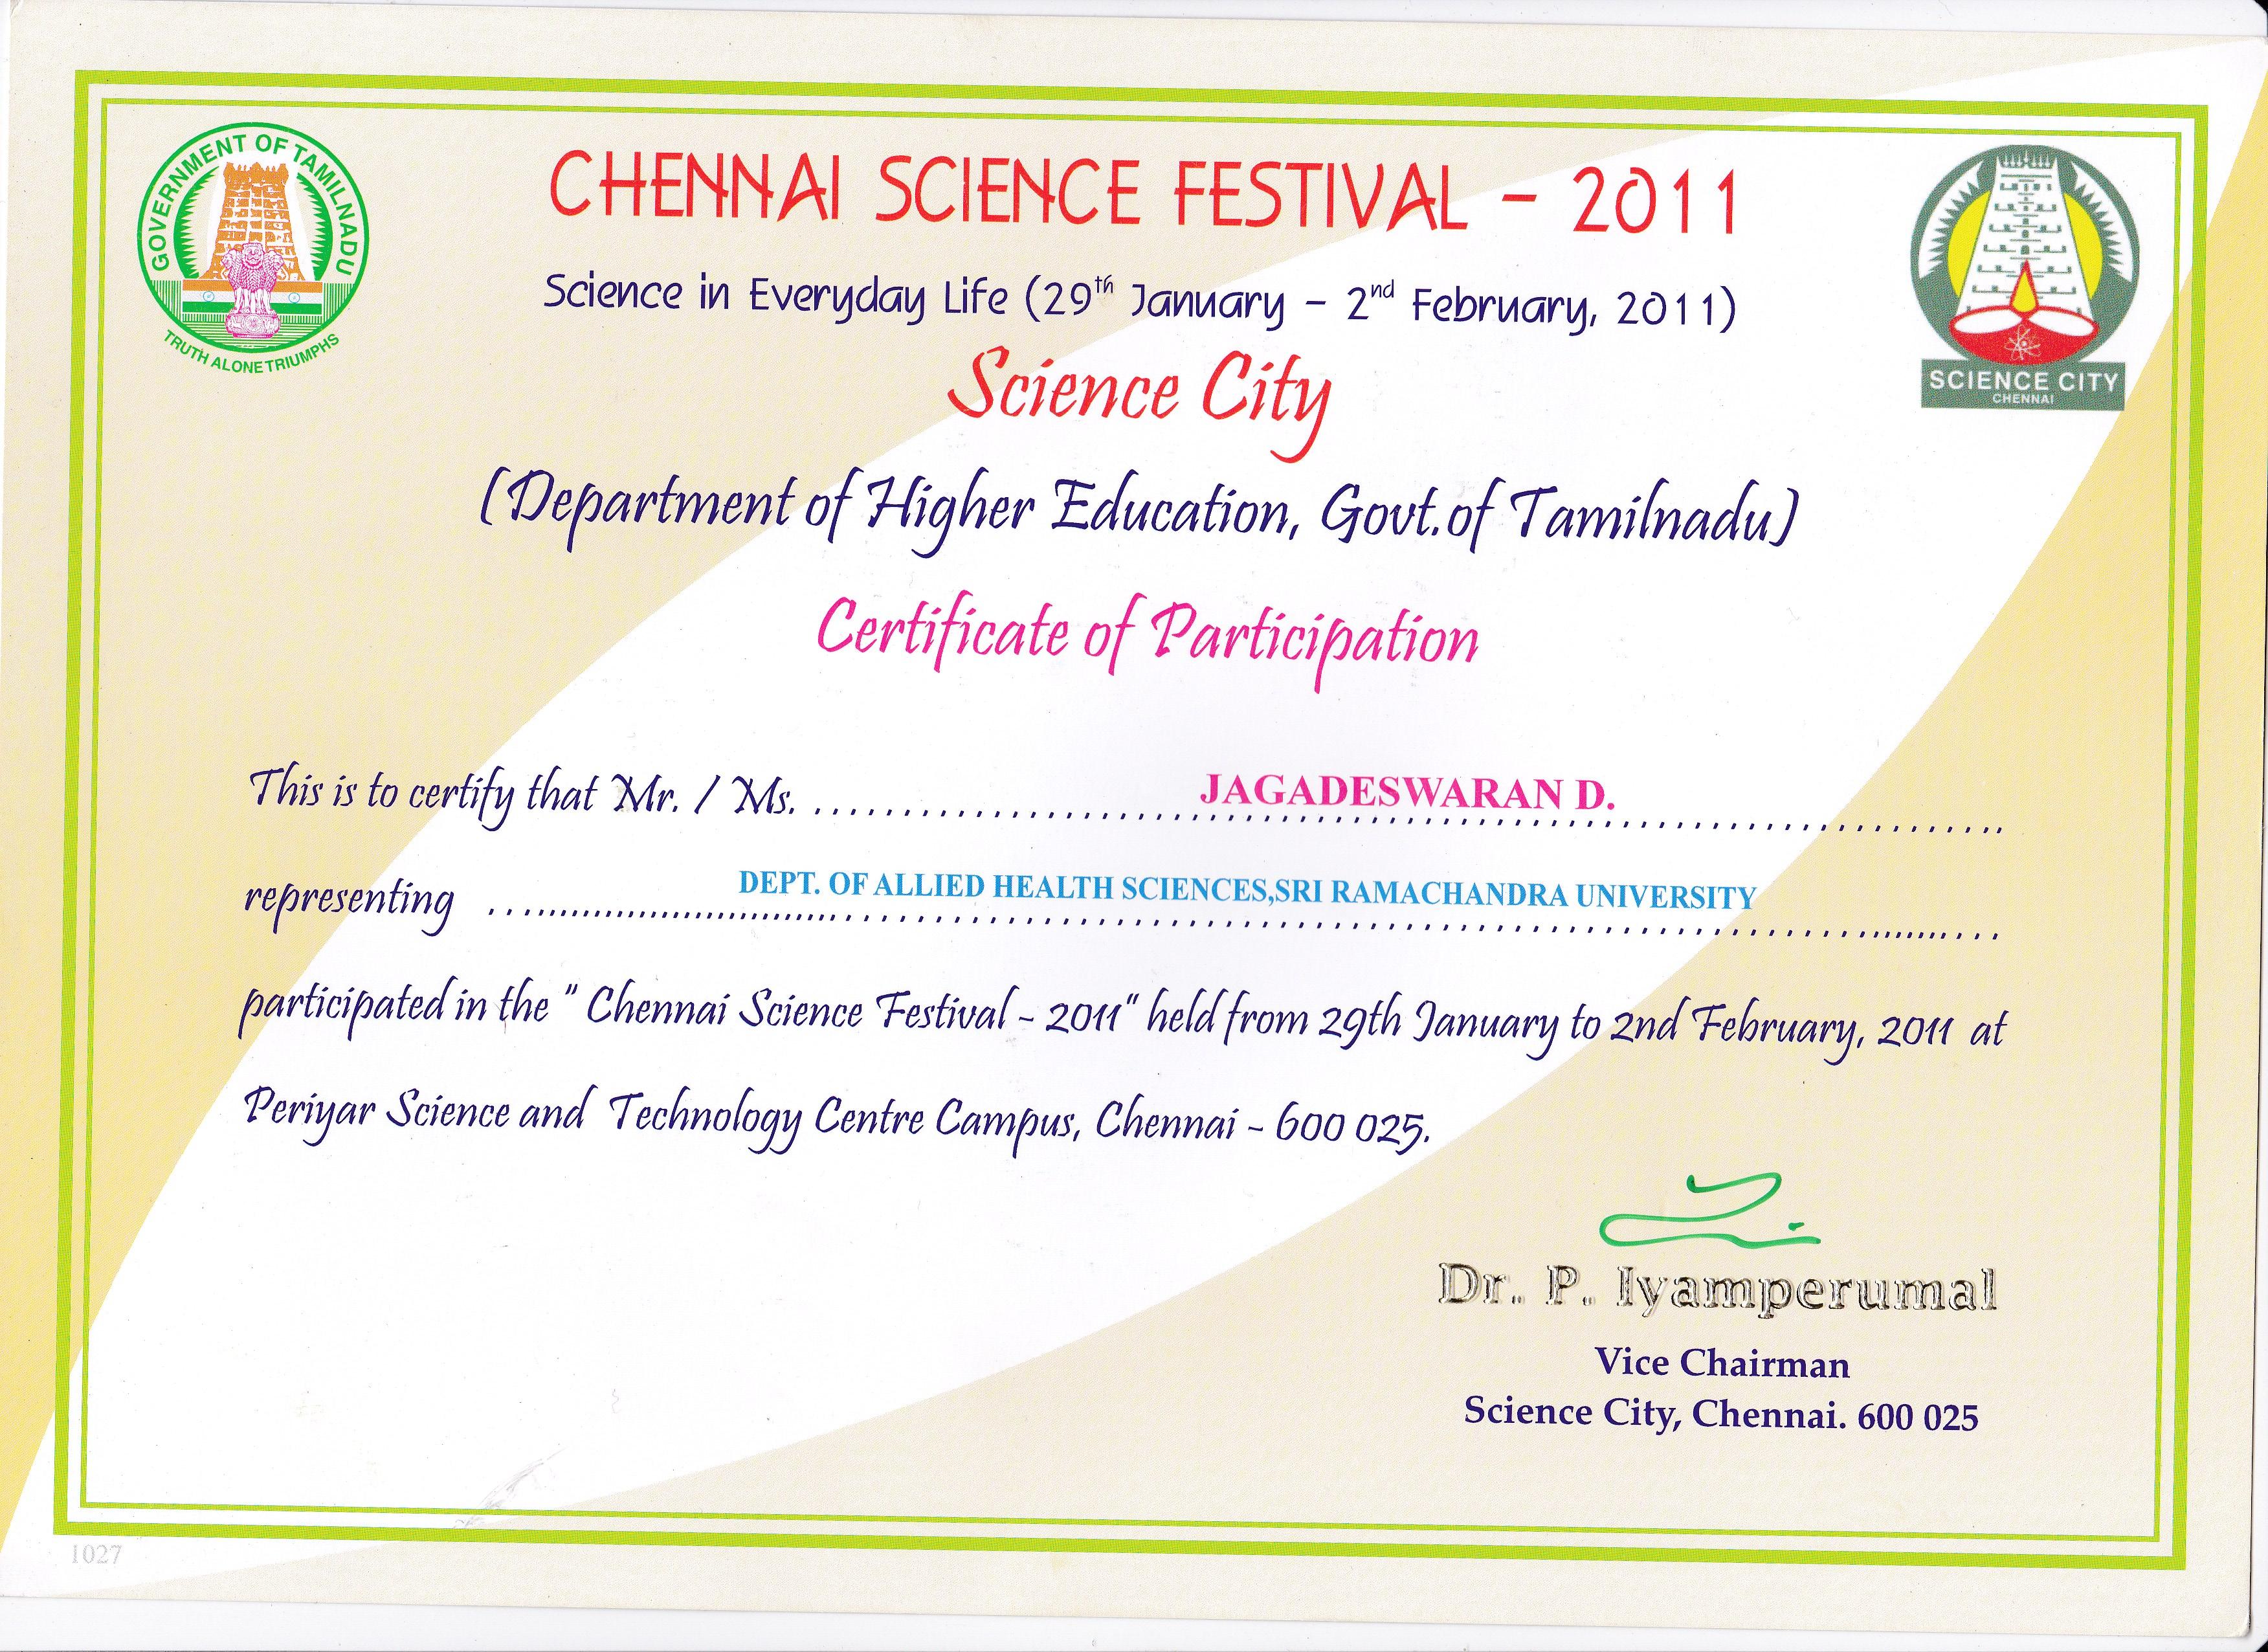 CHENNAI SCIENCE FESTIVAL.jpg